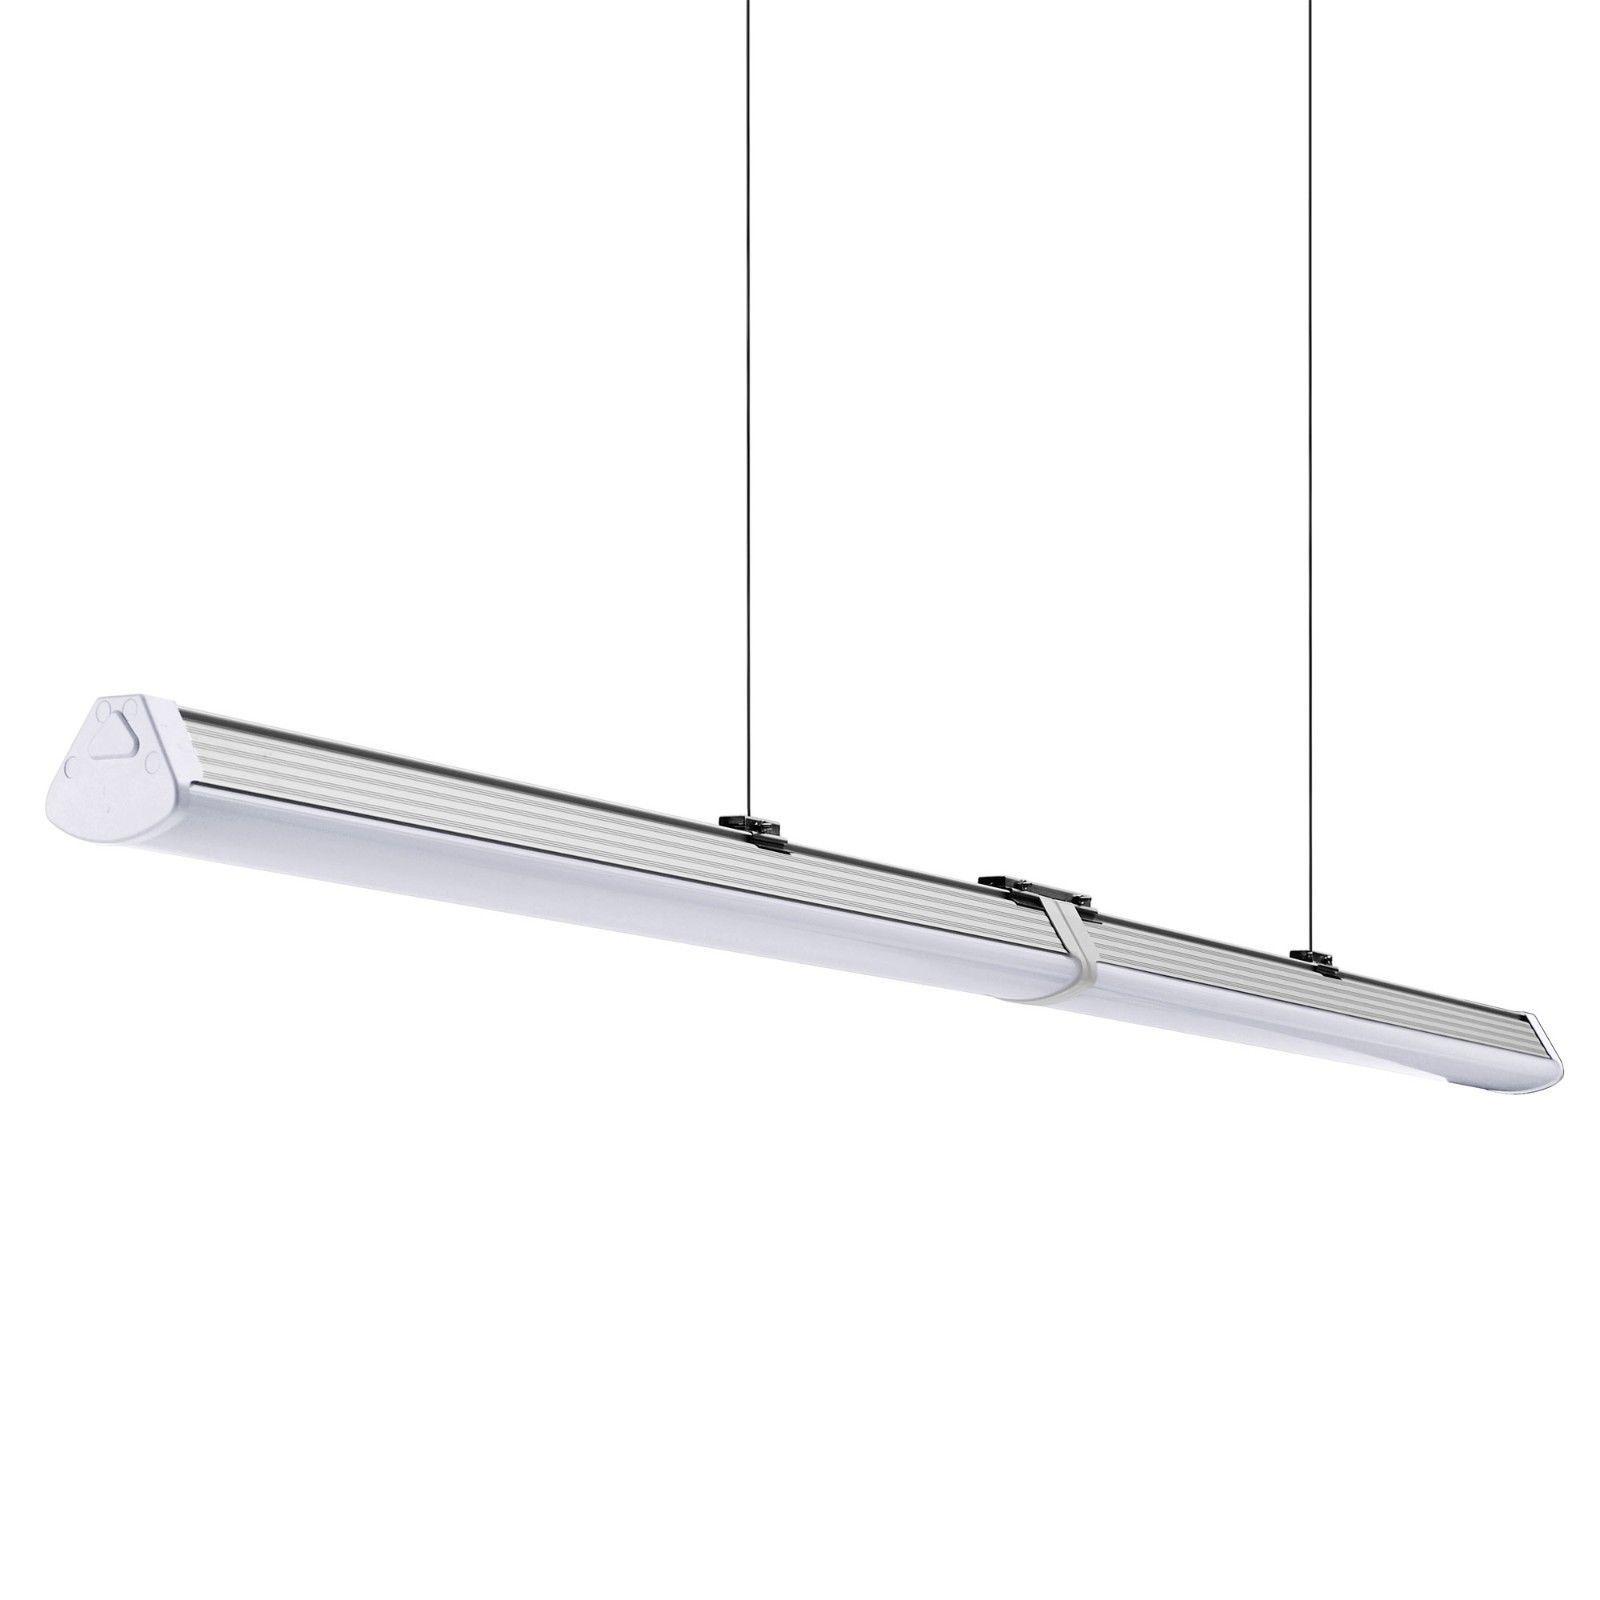 Led Linear Hallenleuchte Tube Rohre Leuchte 40w 60w Wannenleuchte Lichtleiste Ebay Lichtleiste Led Wanne